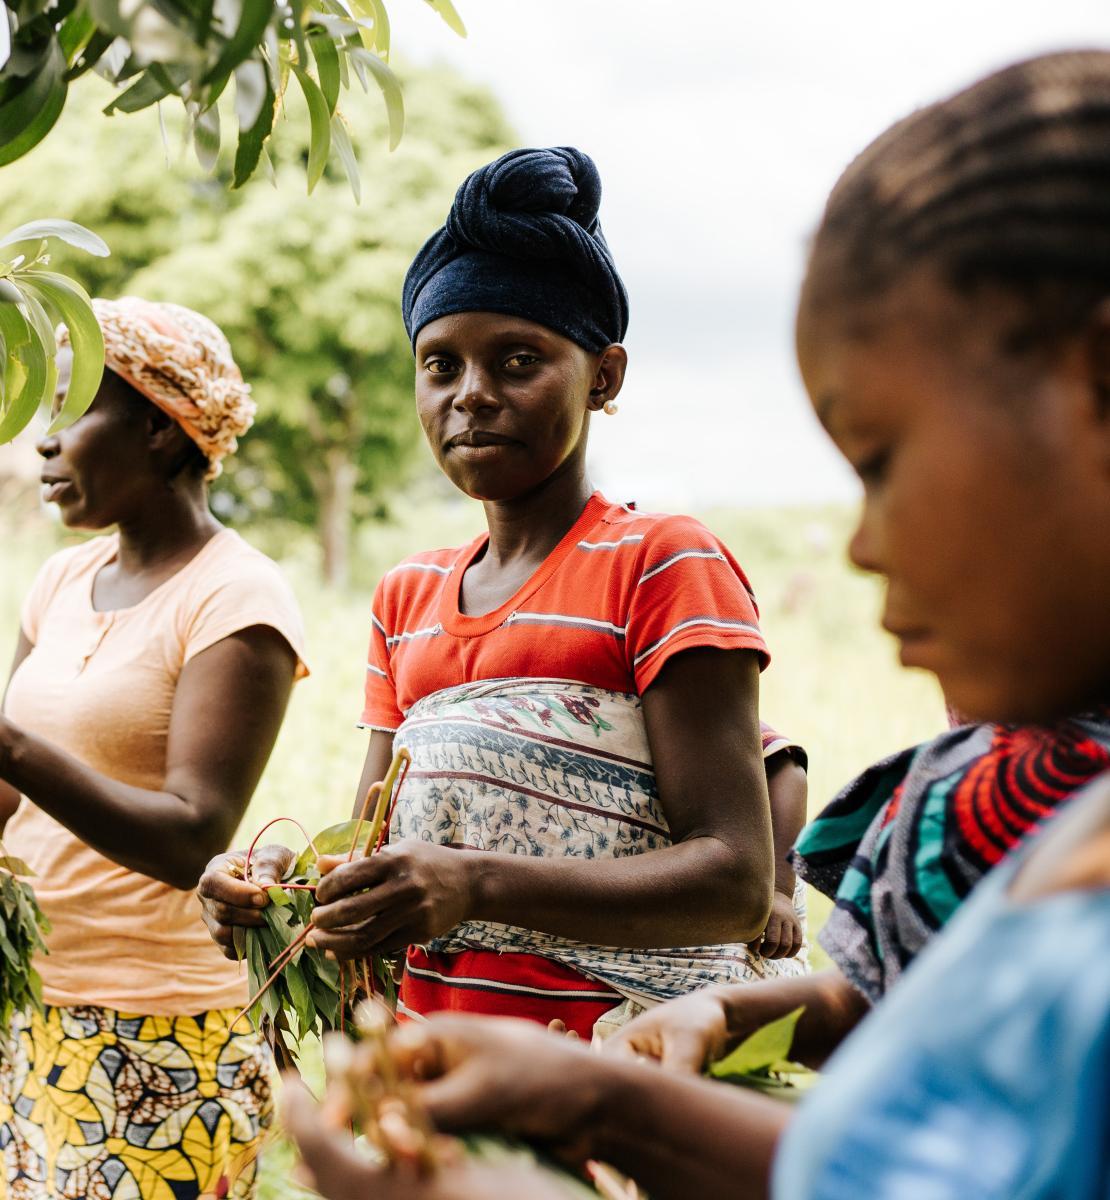 Three women harvest food in a field.